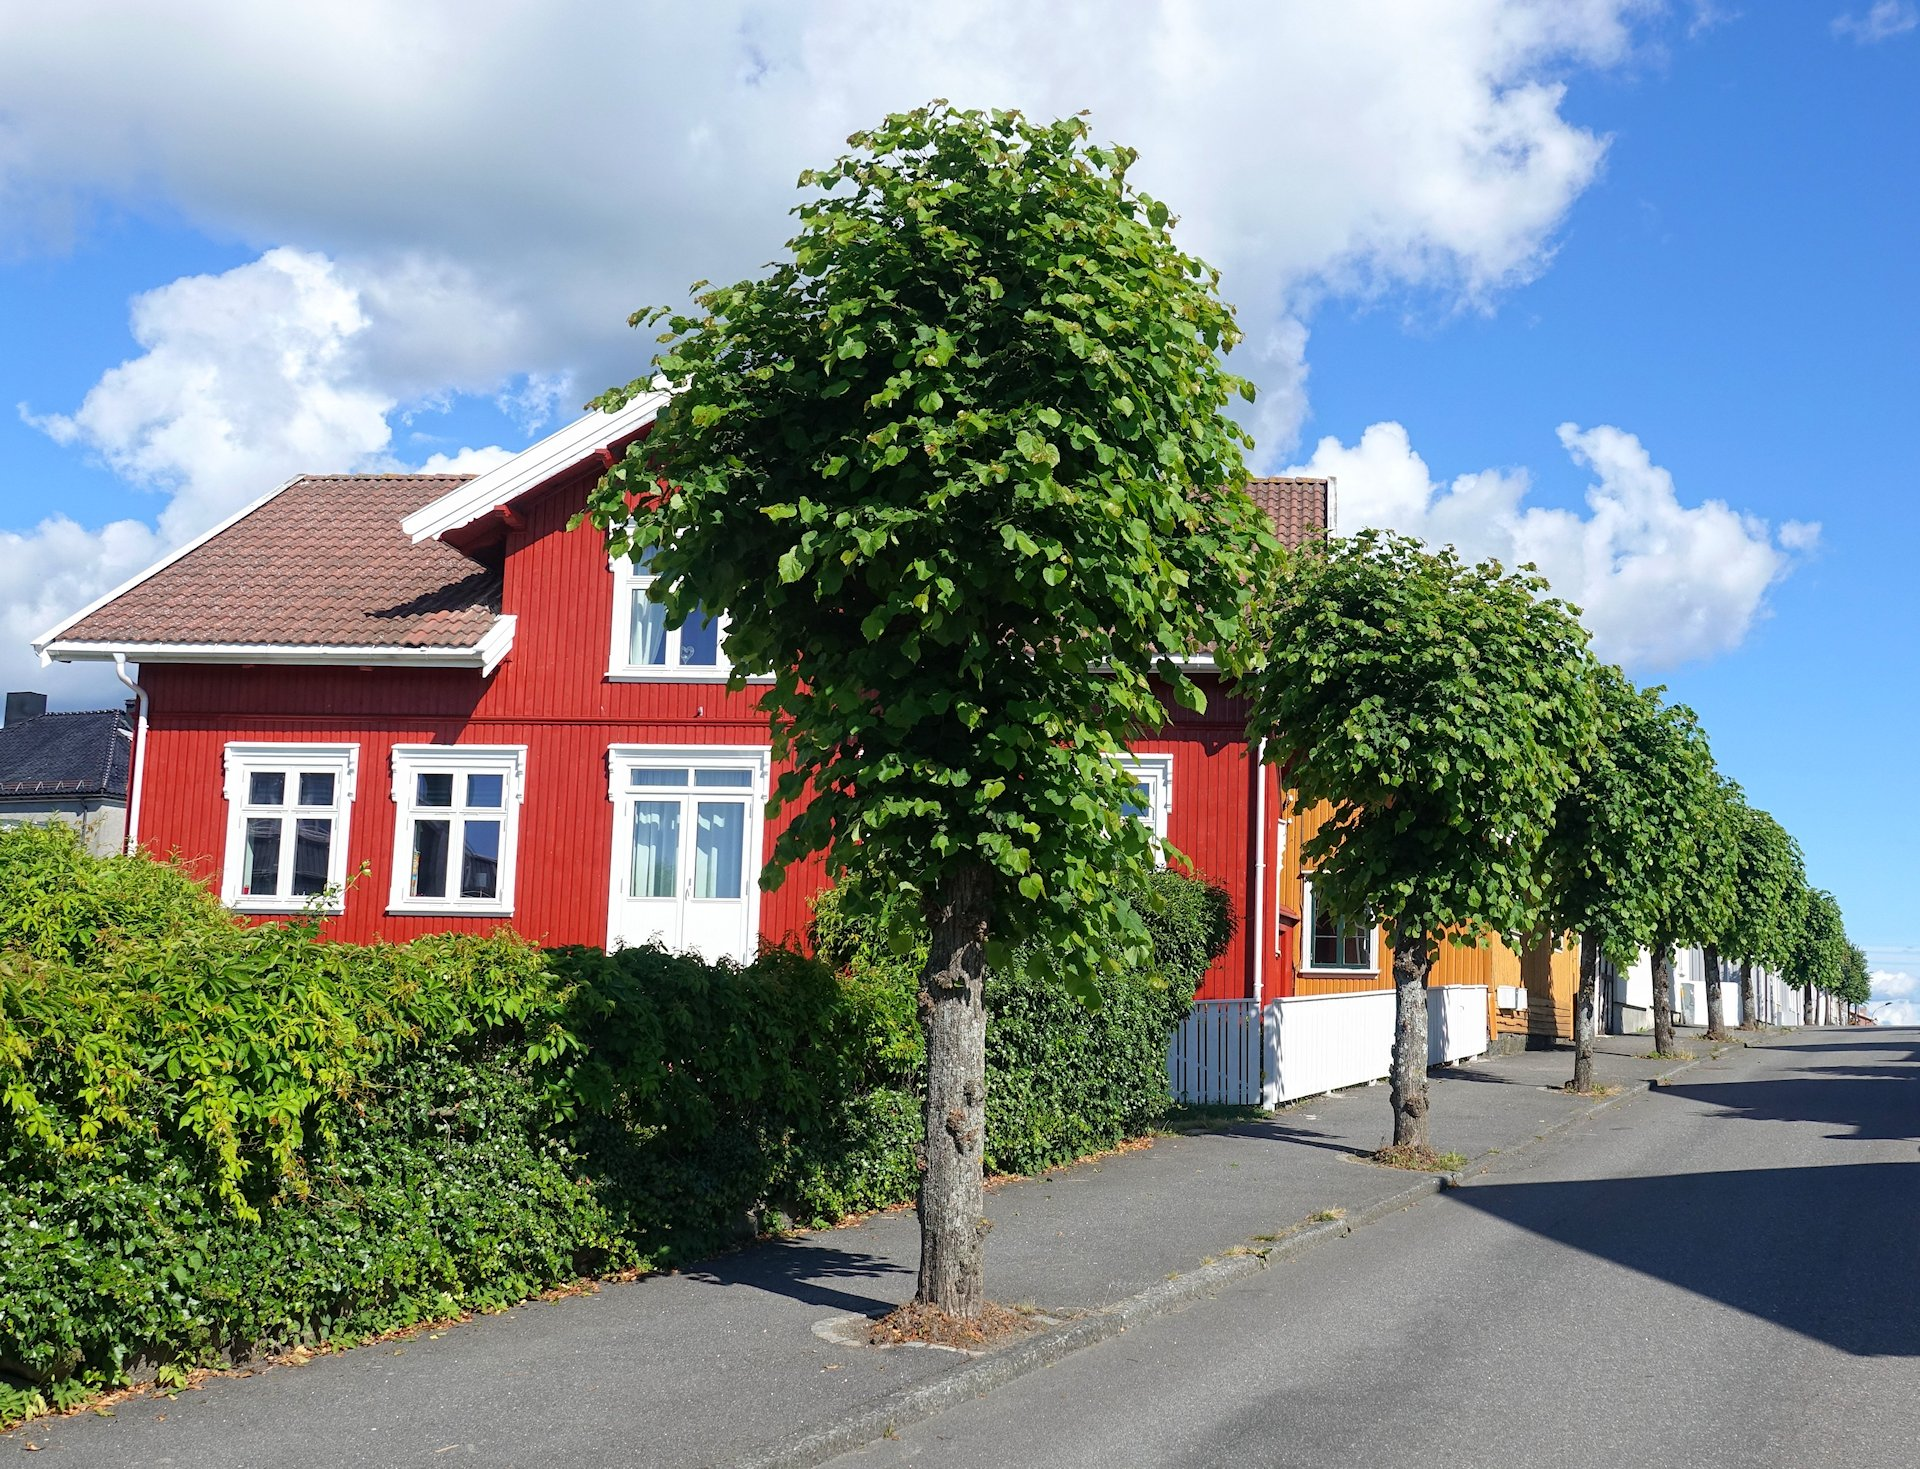 Photo of Skippergaten, a street in Stavern, Norway.